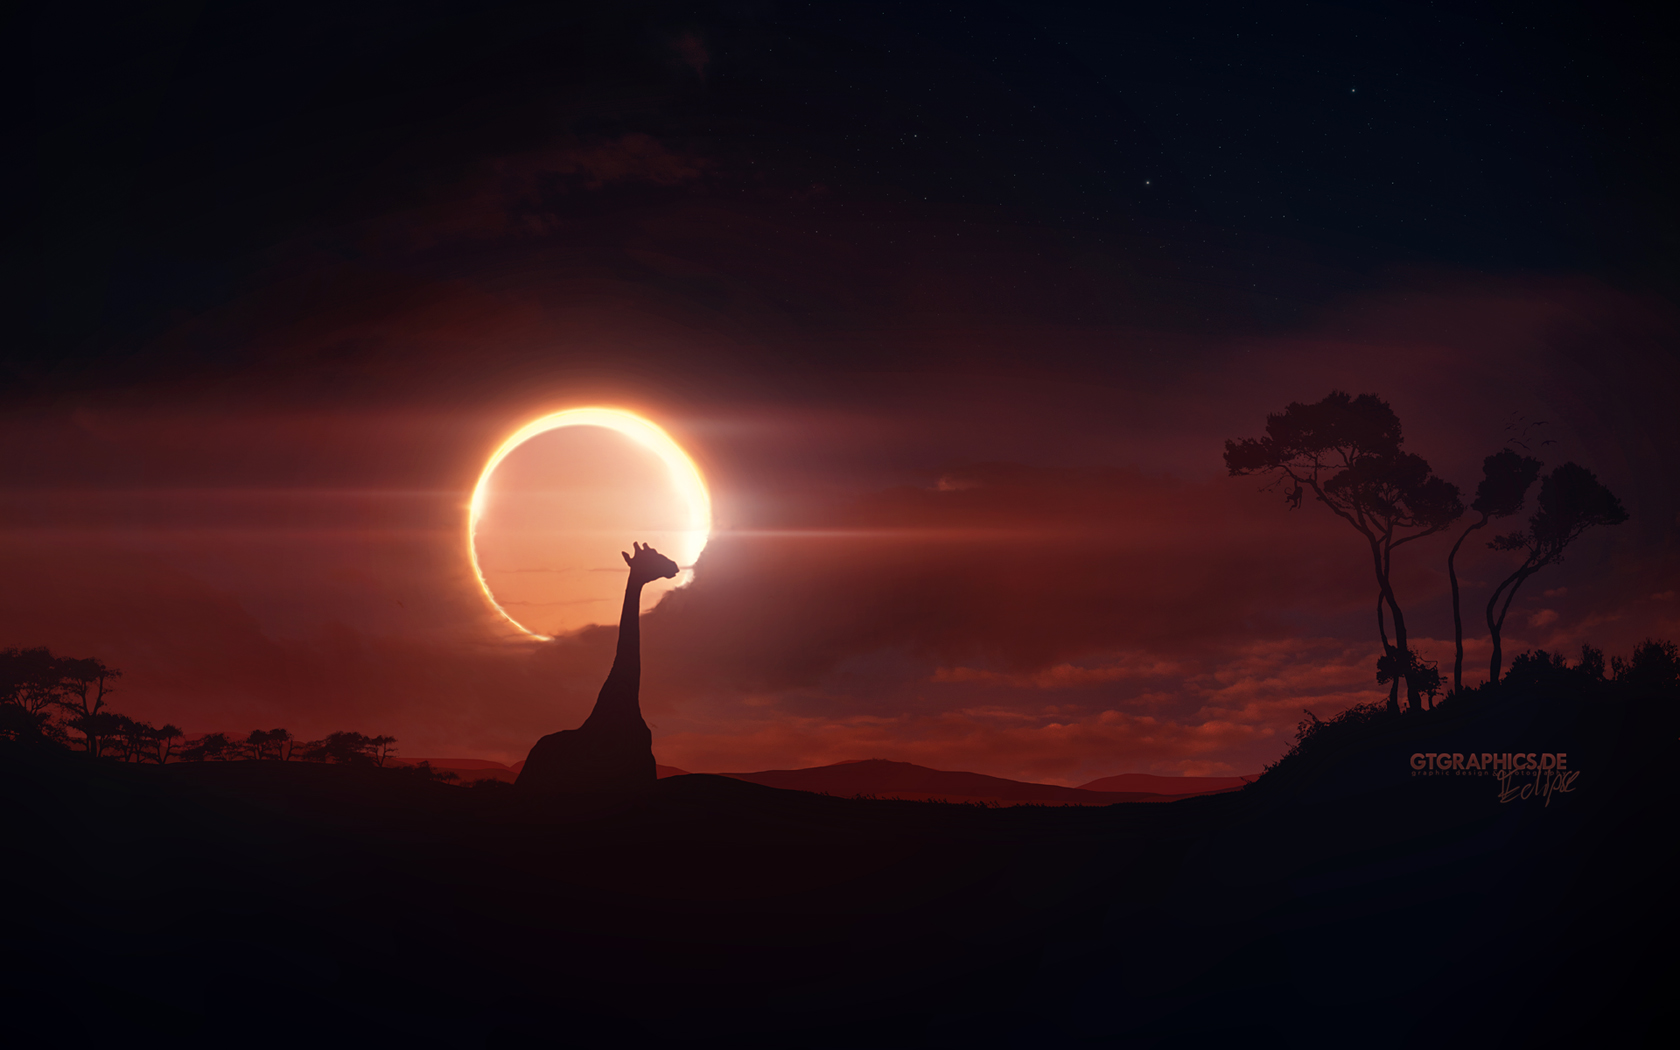 Eclipse by taenaron